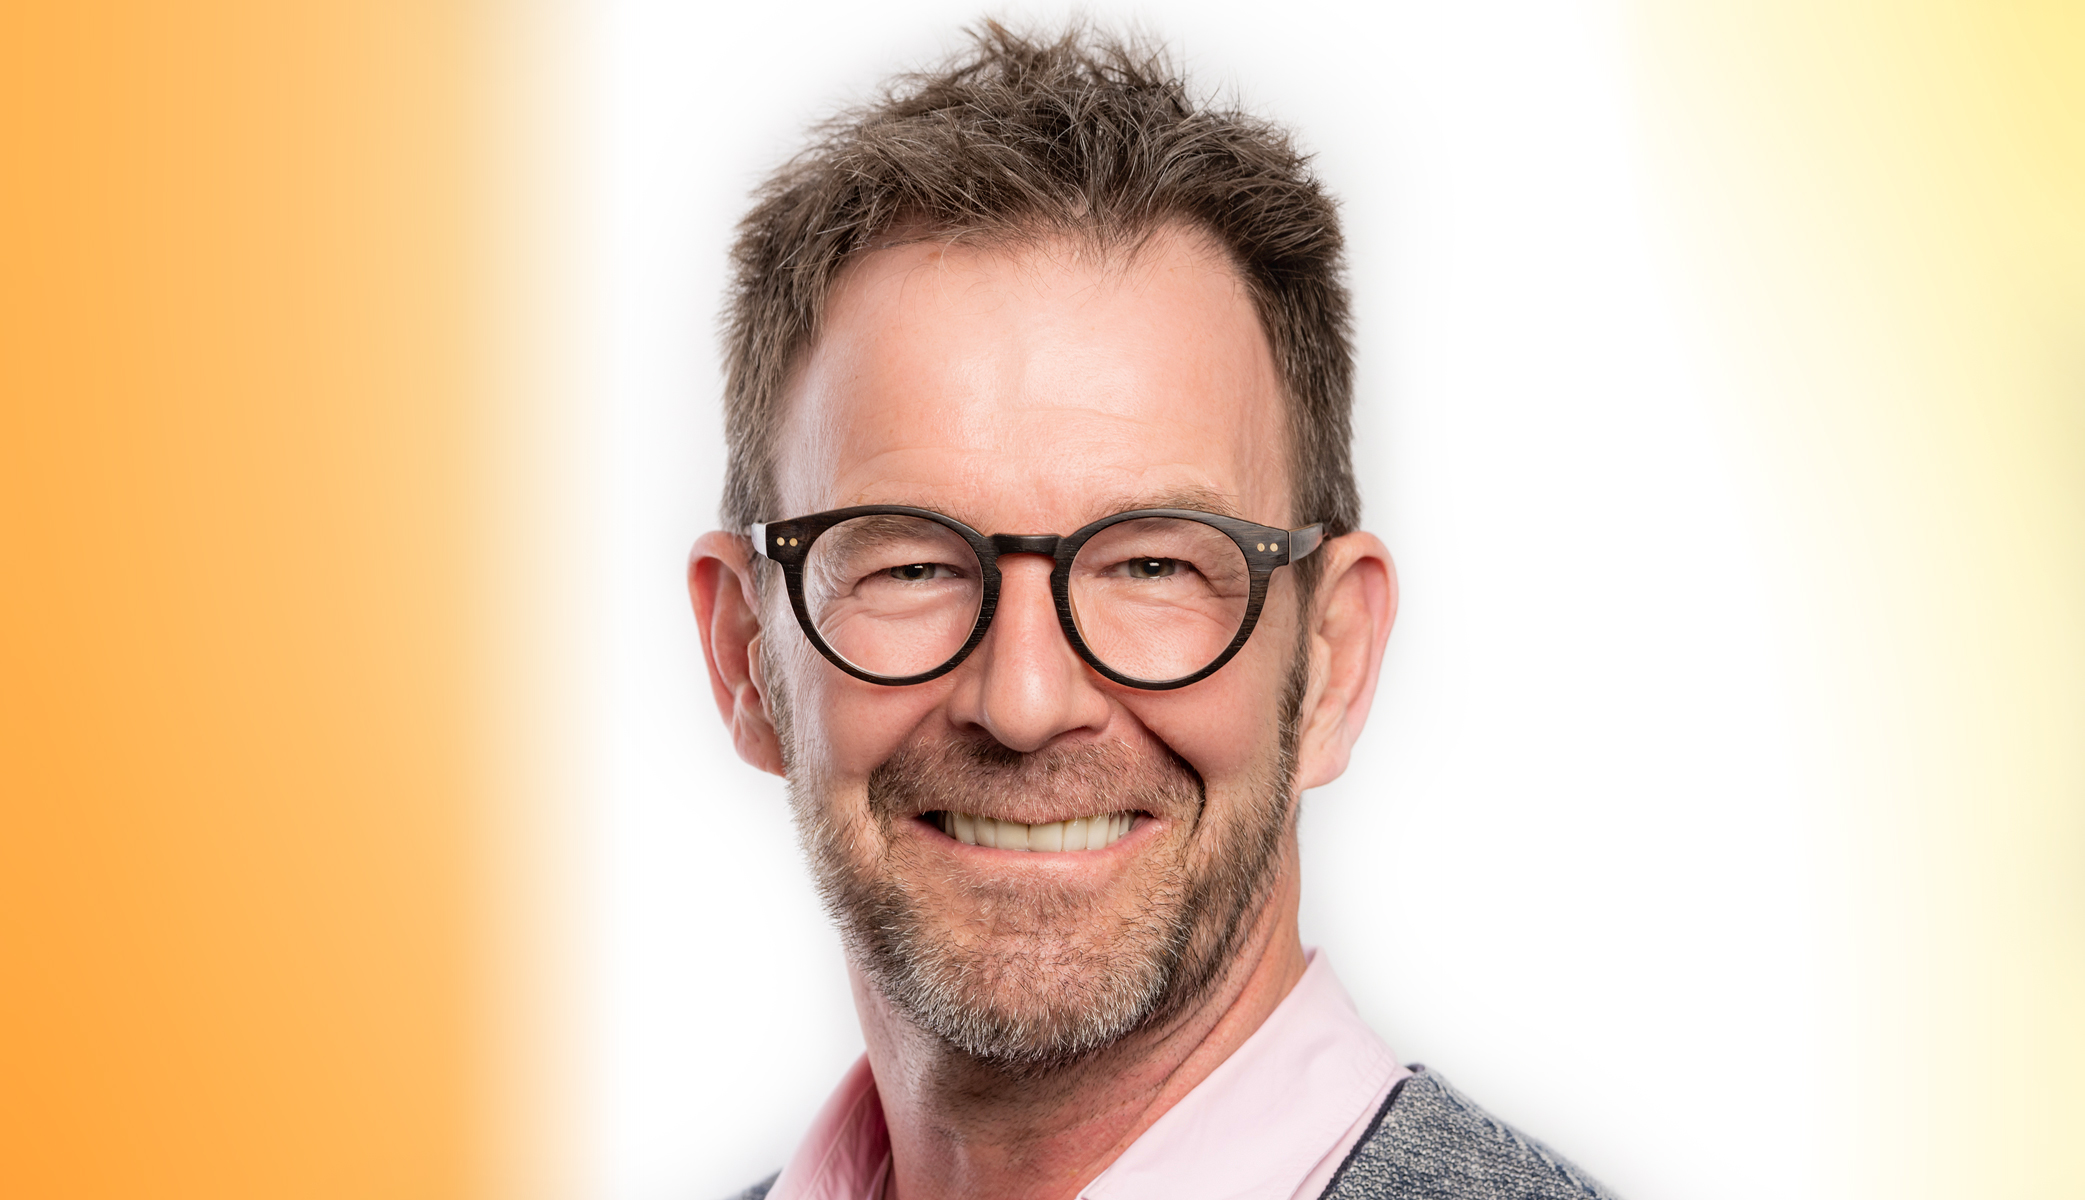 Martin Klinkenberg